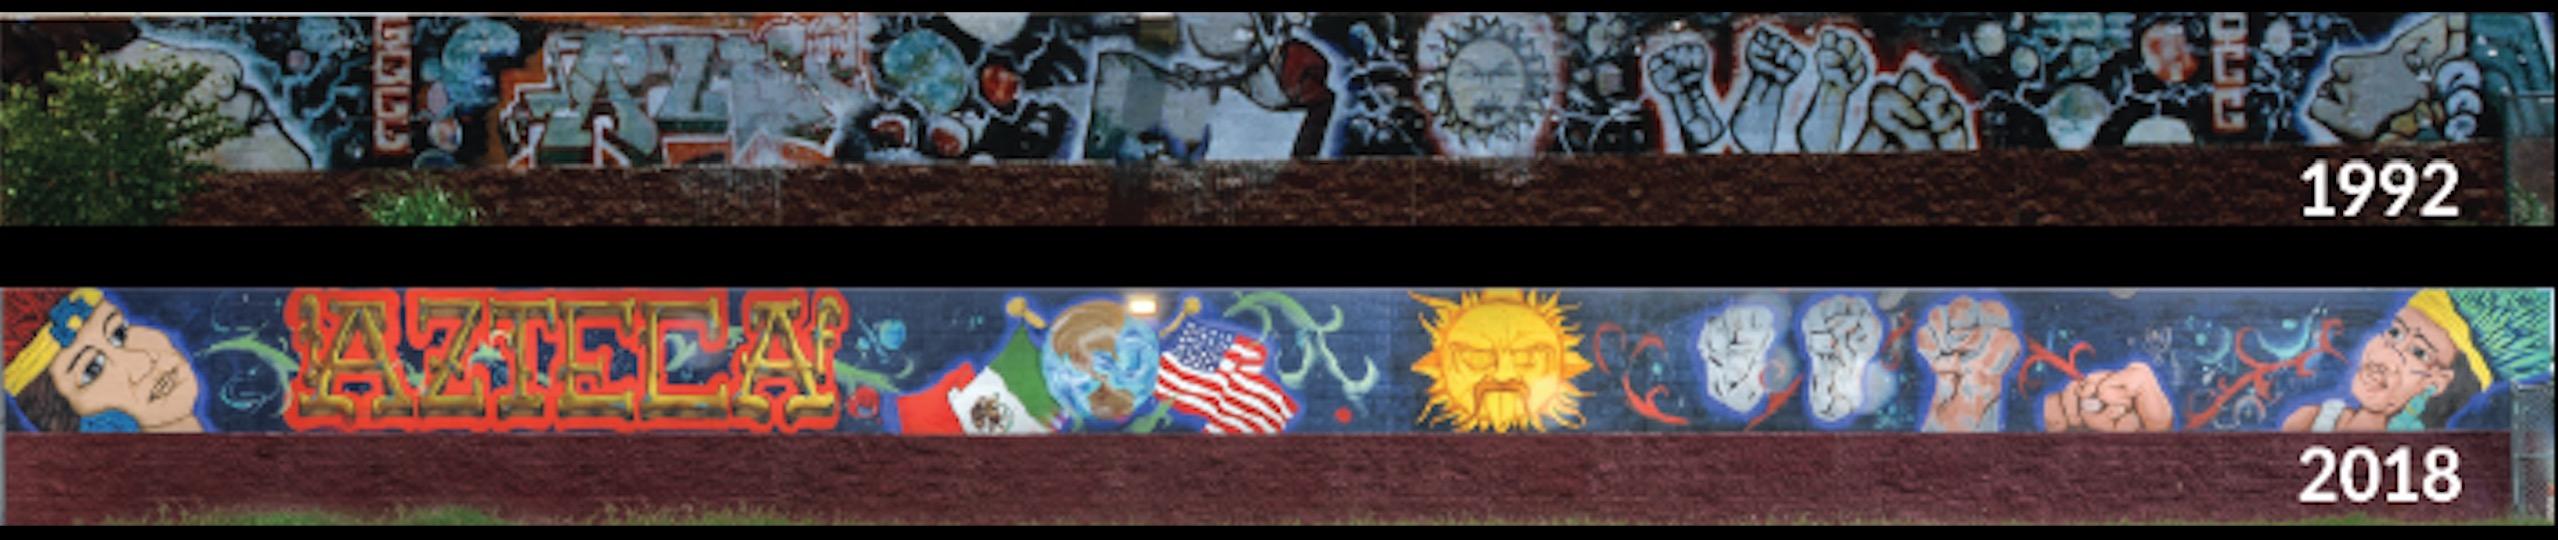 east austin mural